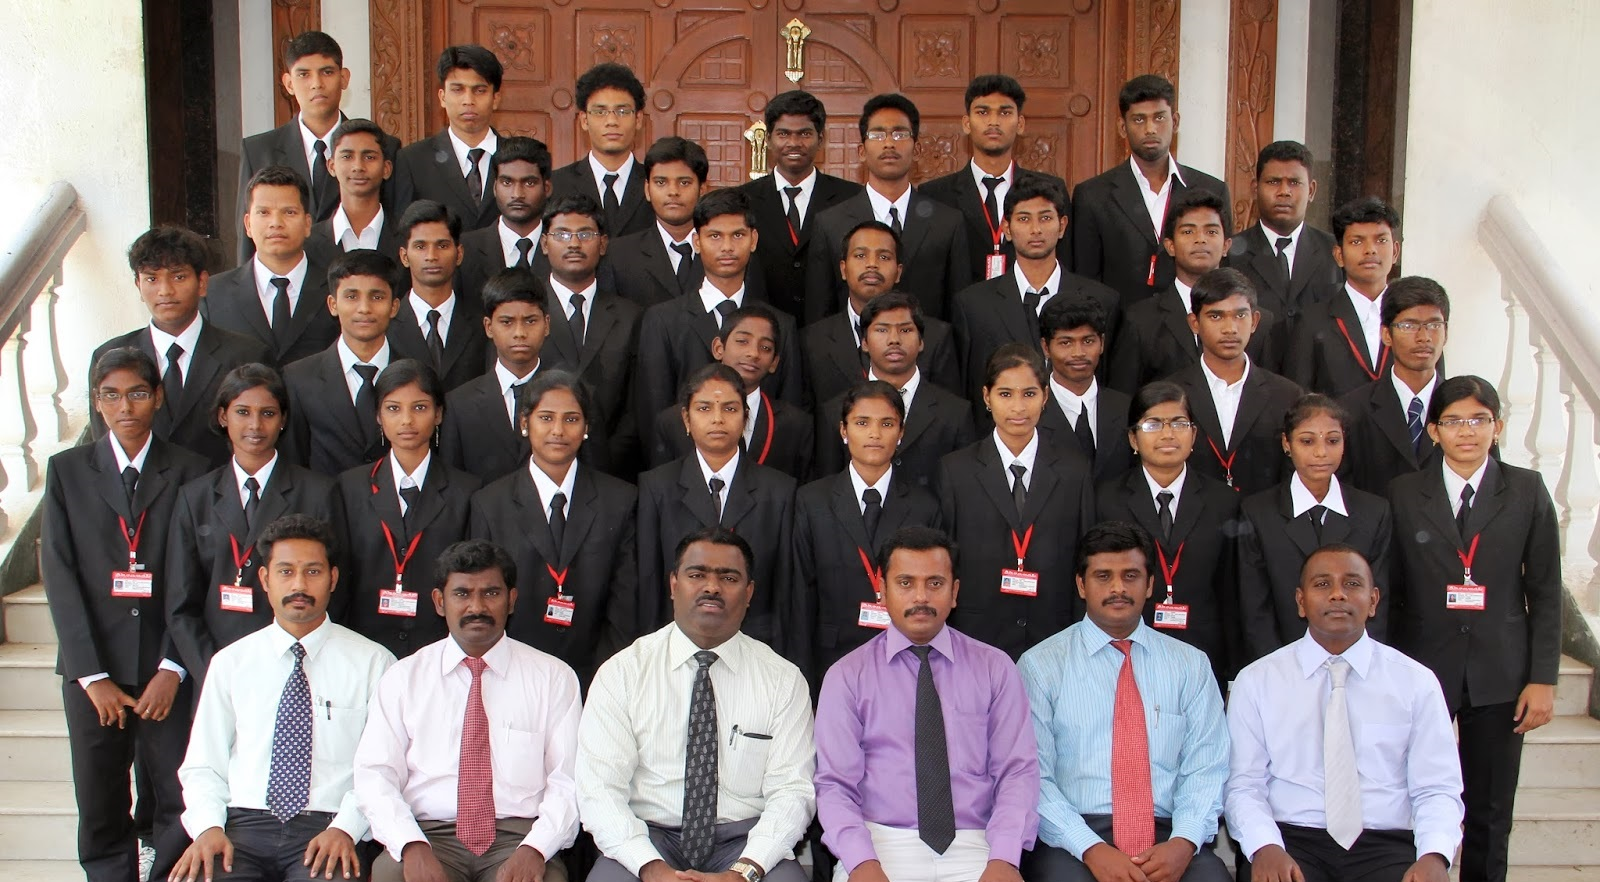 Annamal Institute of Hotel Management, Chennai